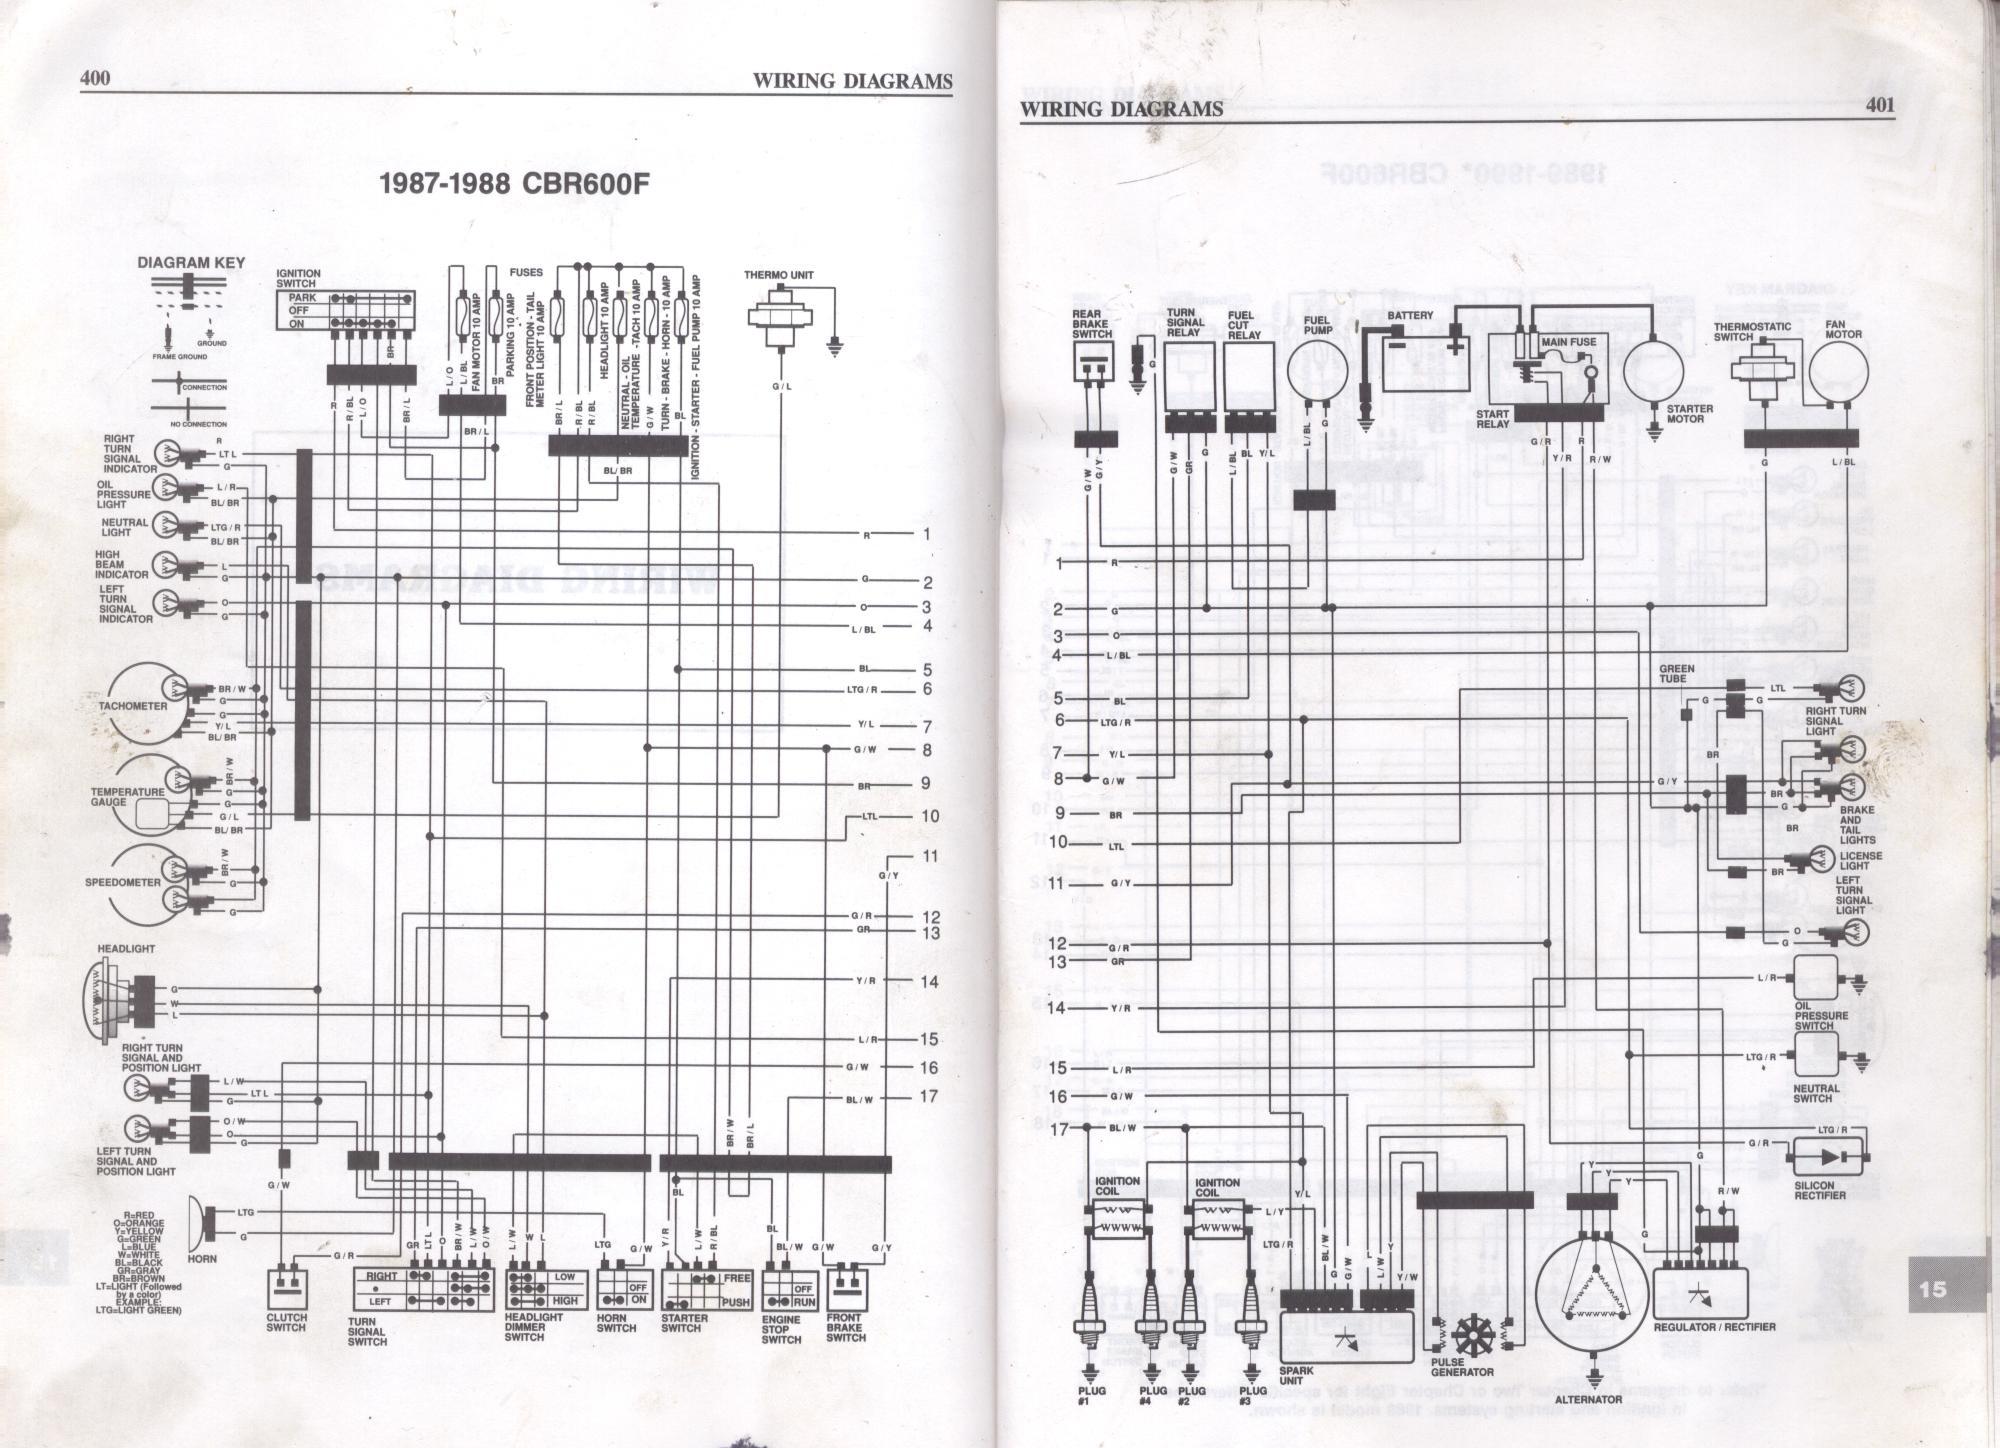 1987 1988 Honda CBR600F Wiring Diagrams?resize\=665%2C481 s i1 wp com www cyclechaos com images 0 0e 1 virago wiring diagram at webbmarketing.co